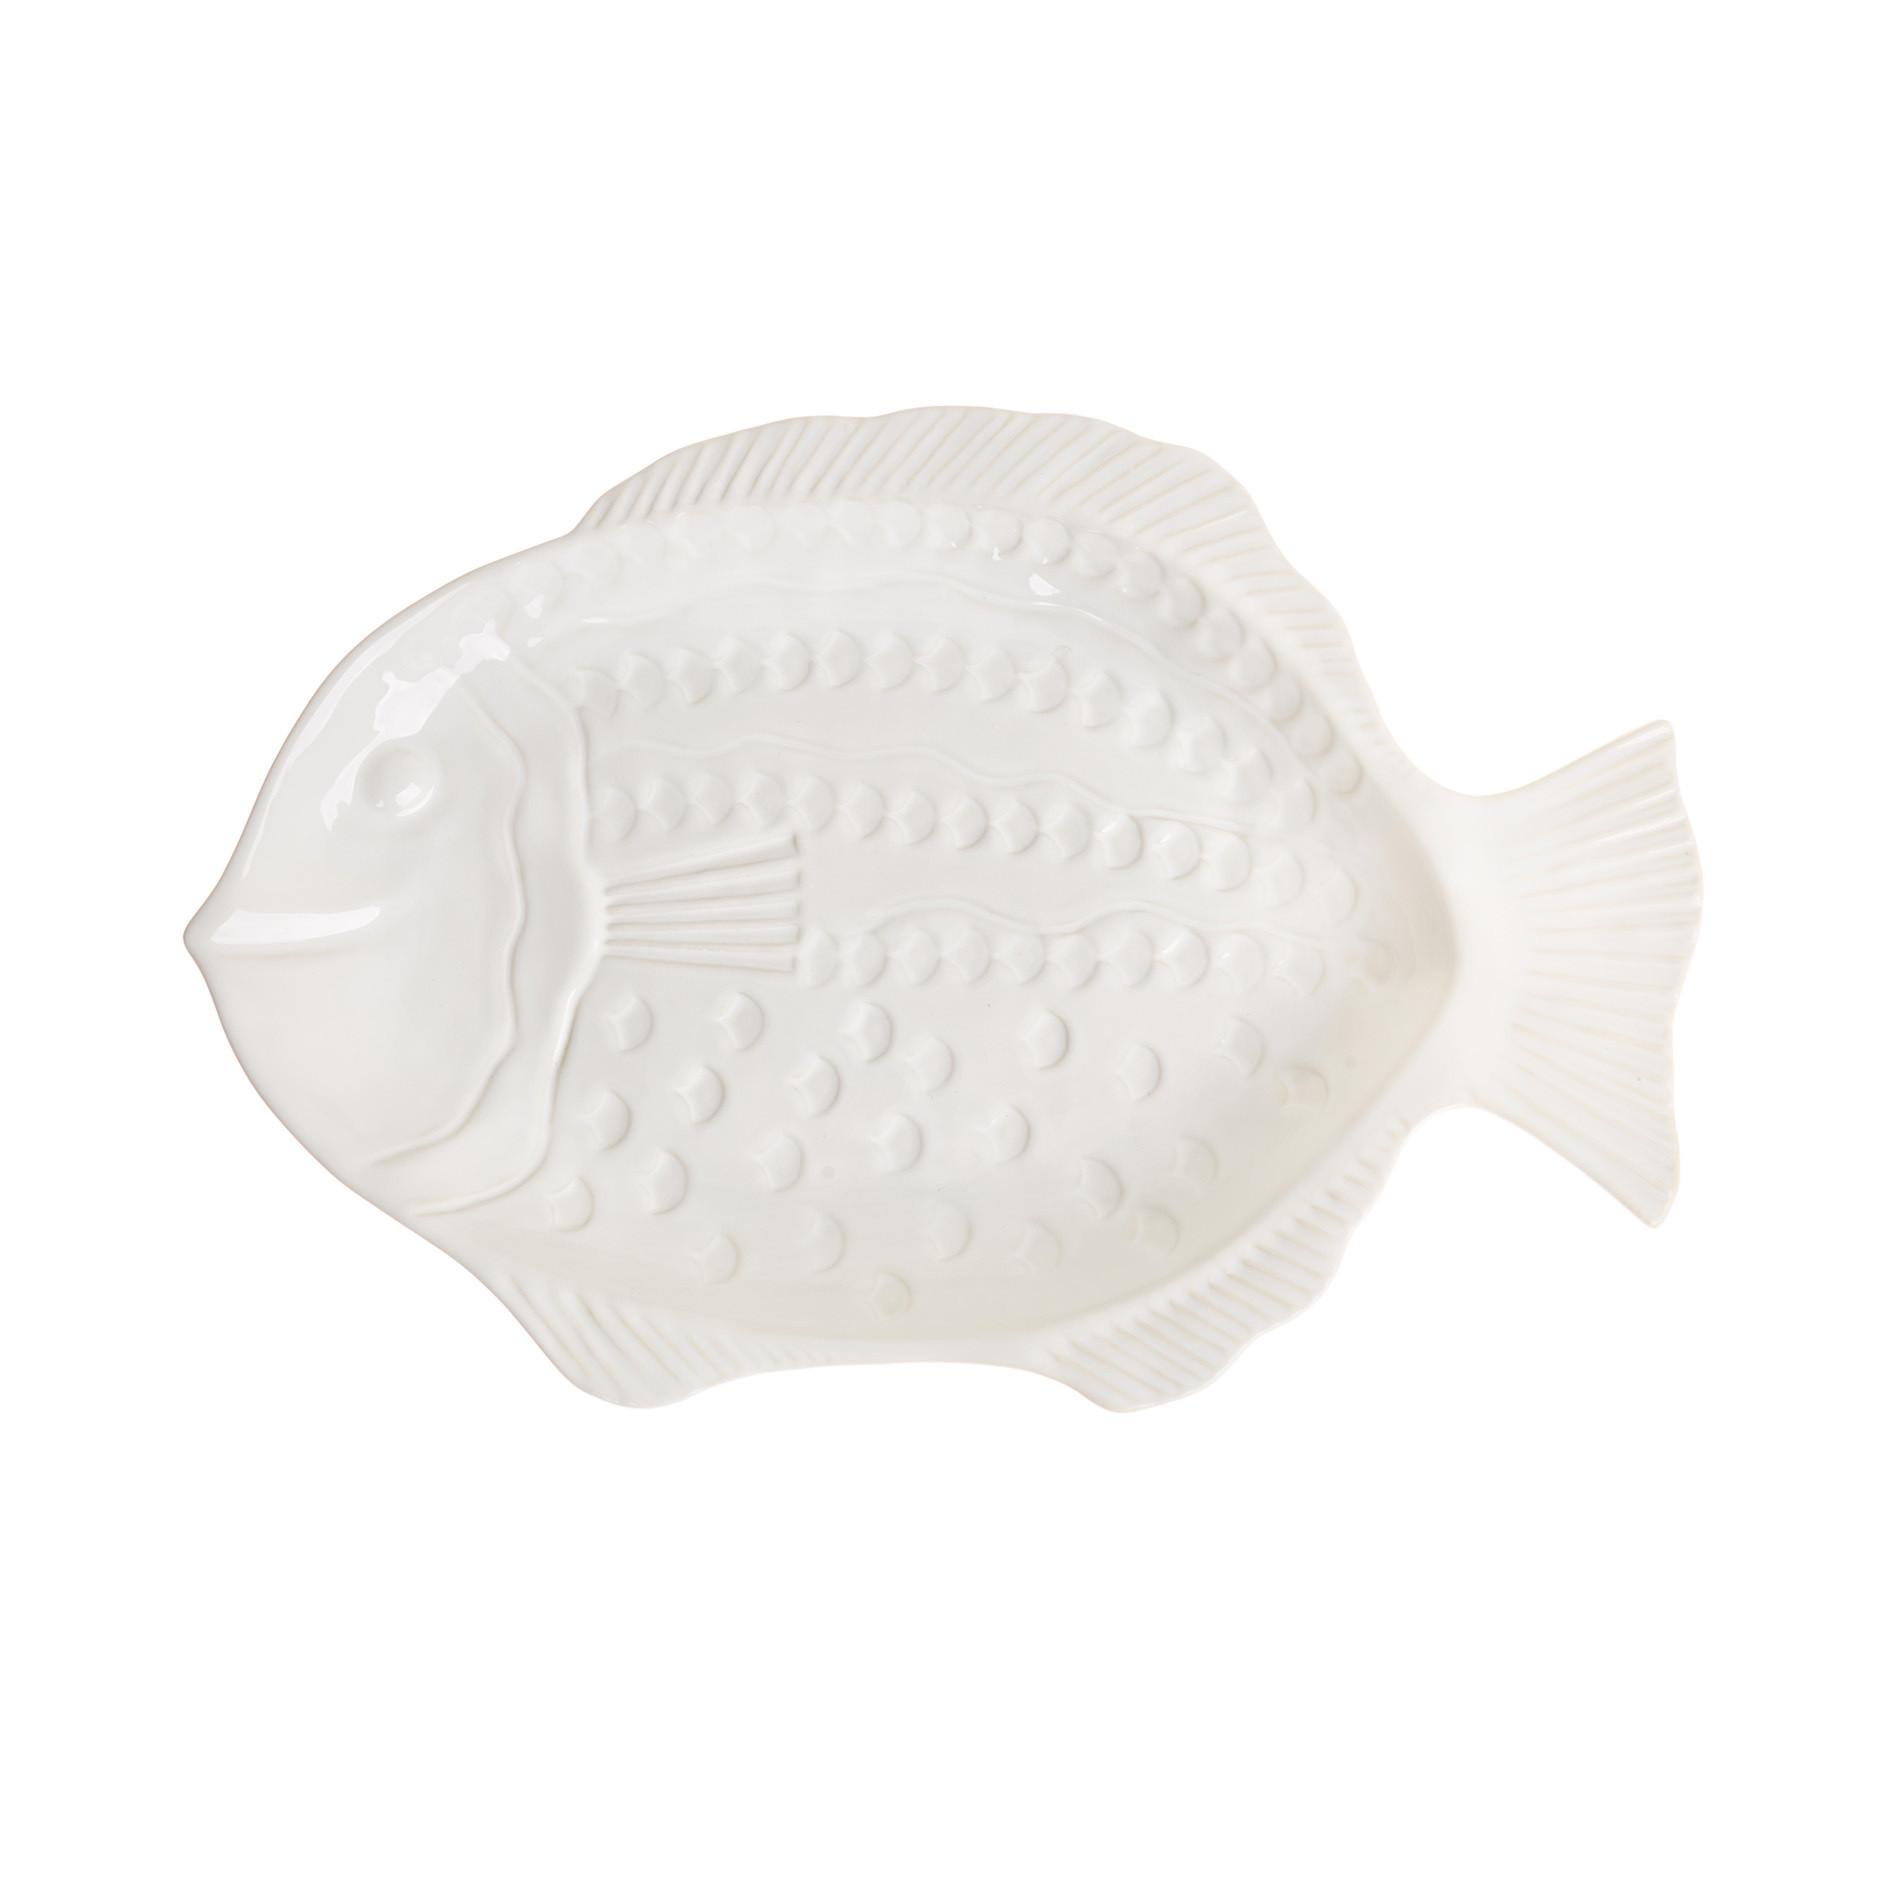 Coppa ceramica a pesce, Bianco, large image number 1